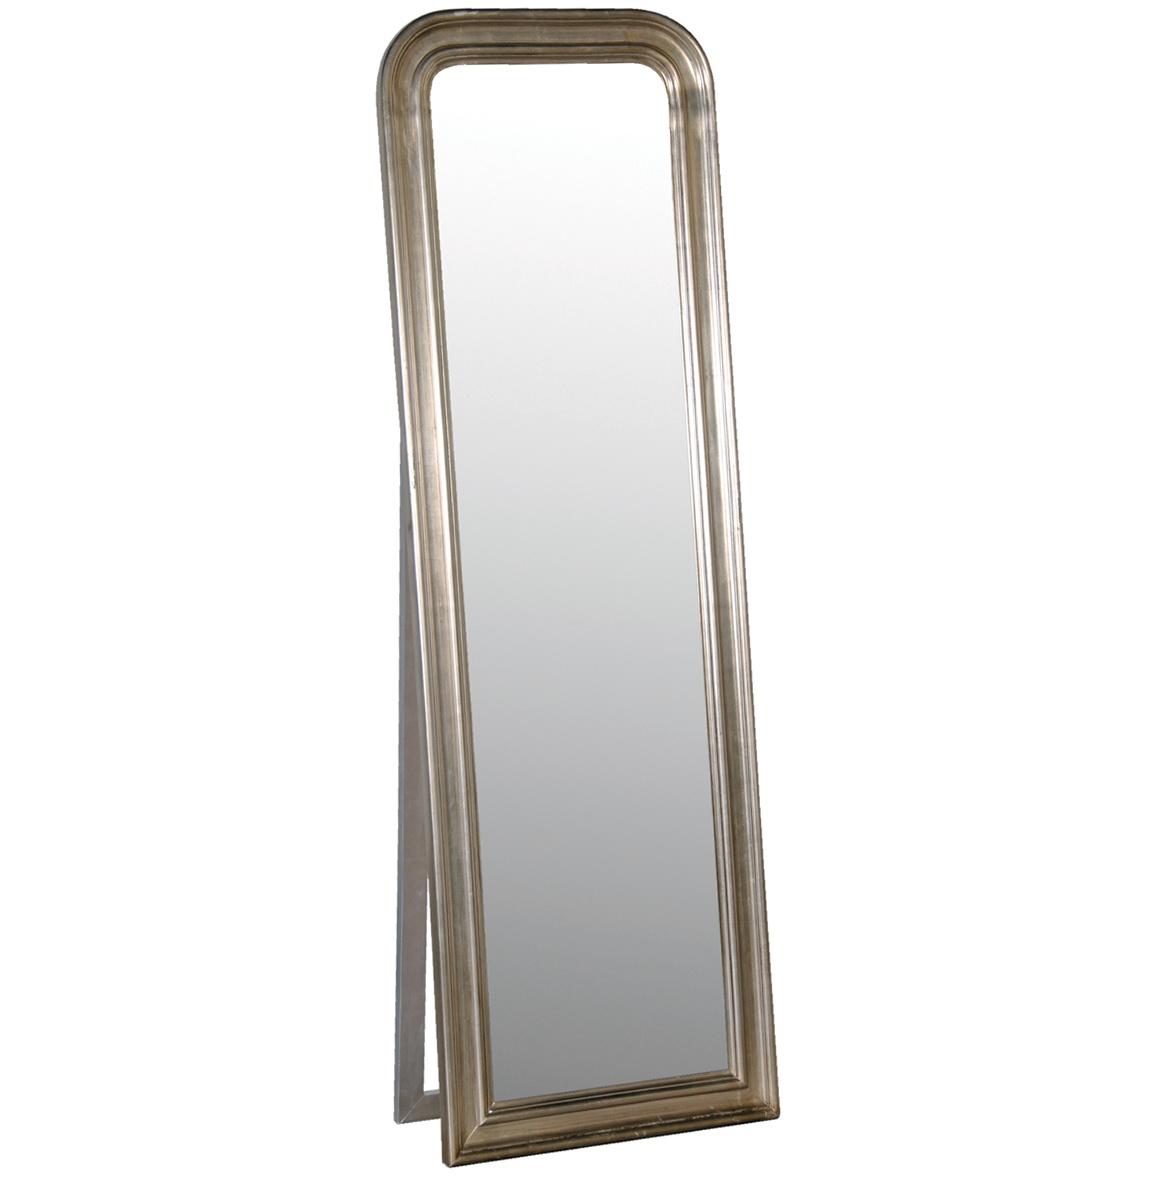 Bedroom Full Length Wall Mirrors